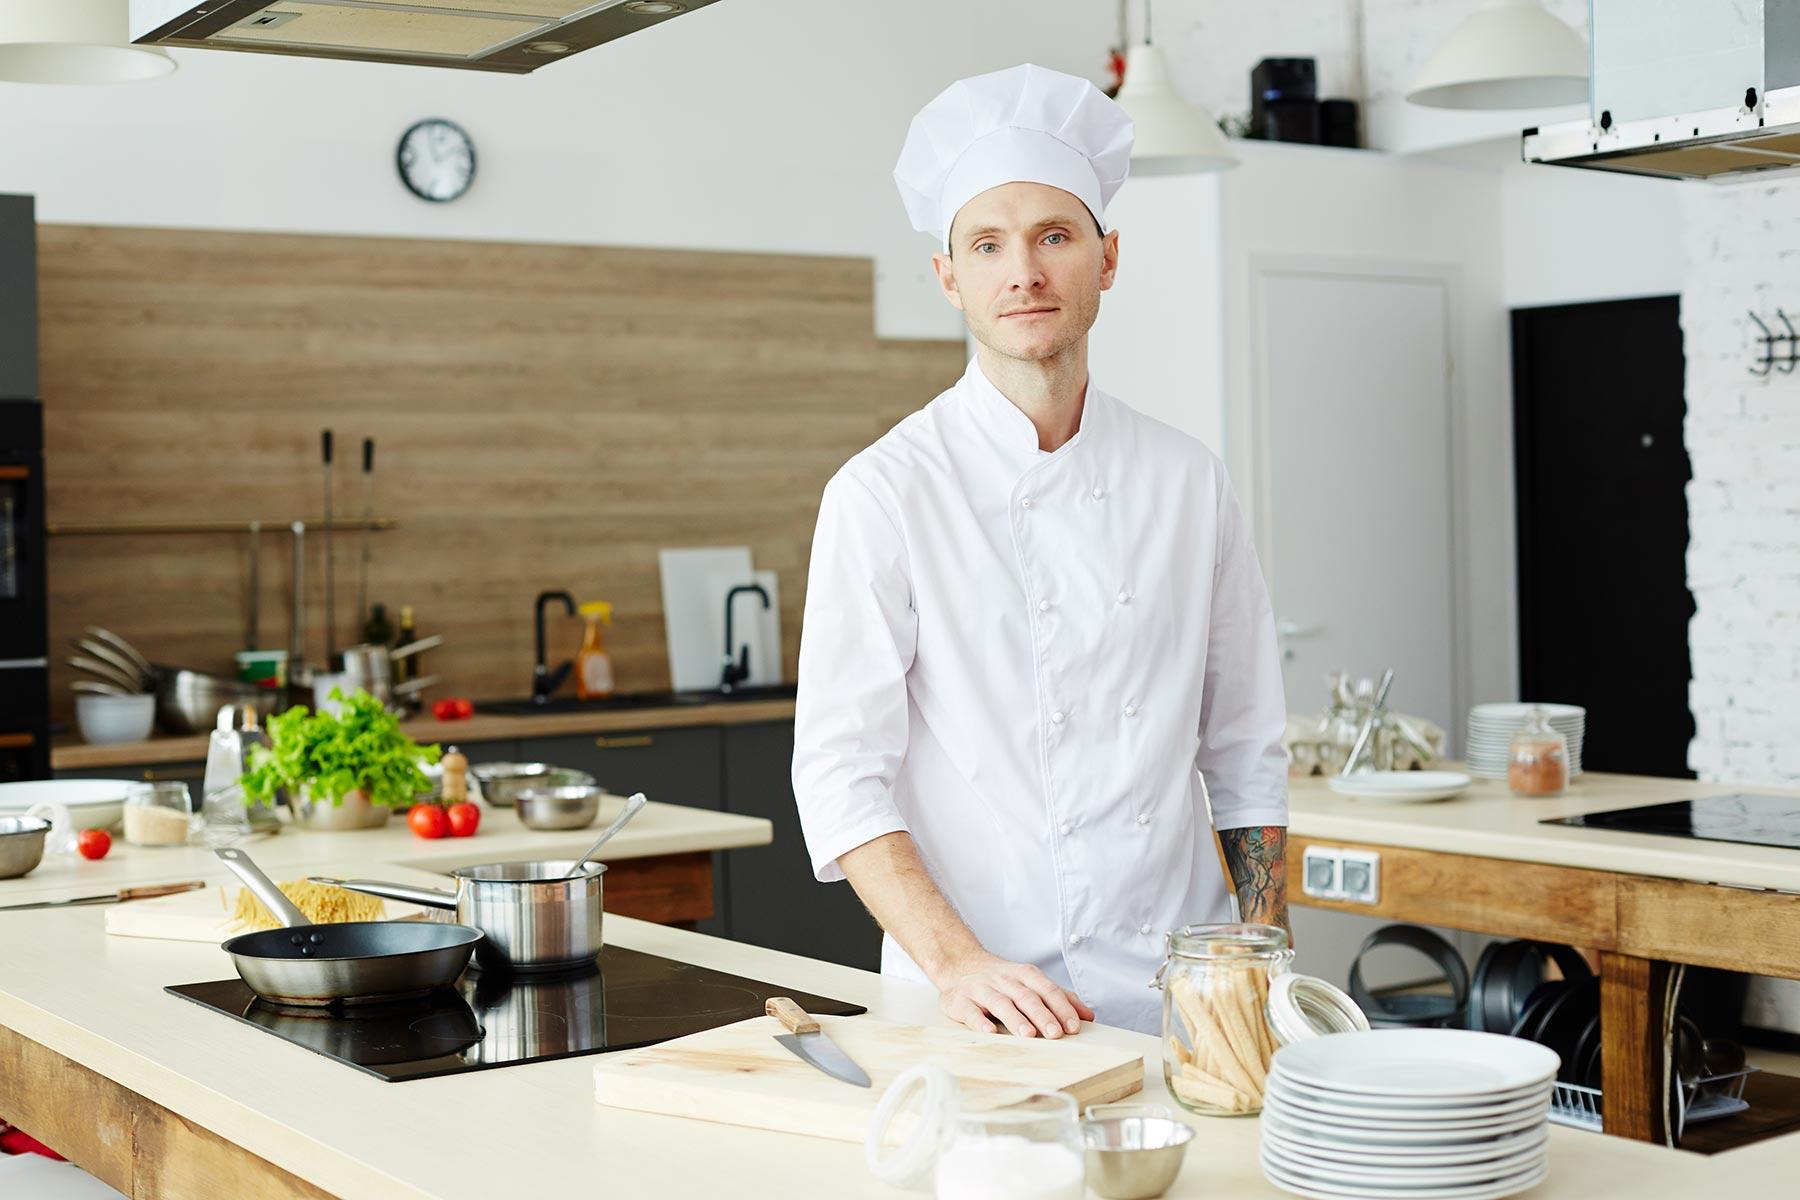 male-chef-PZ4FTHY.jpg